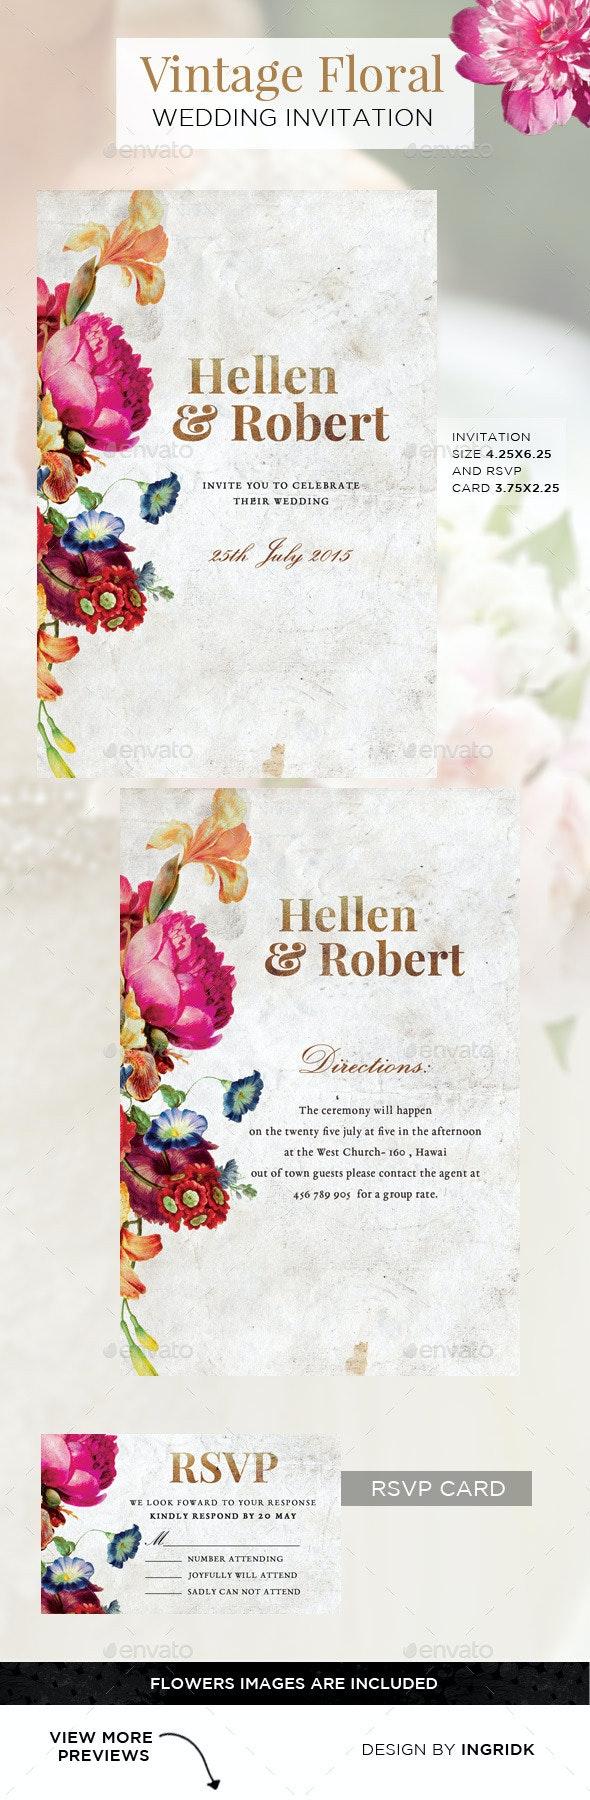 Vintage Floral Wedding Invitation with RSVP Card - Weddings Cards & Invites